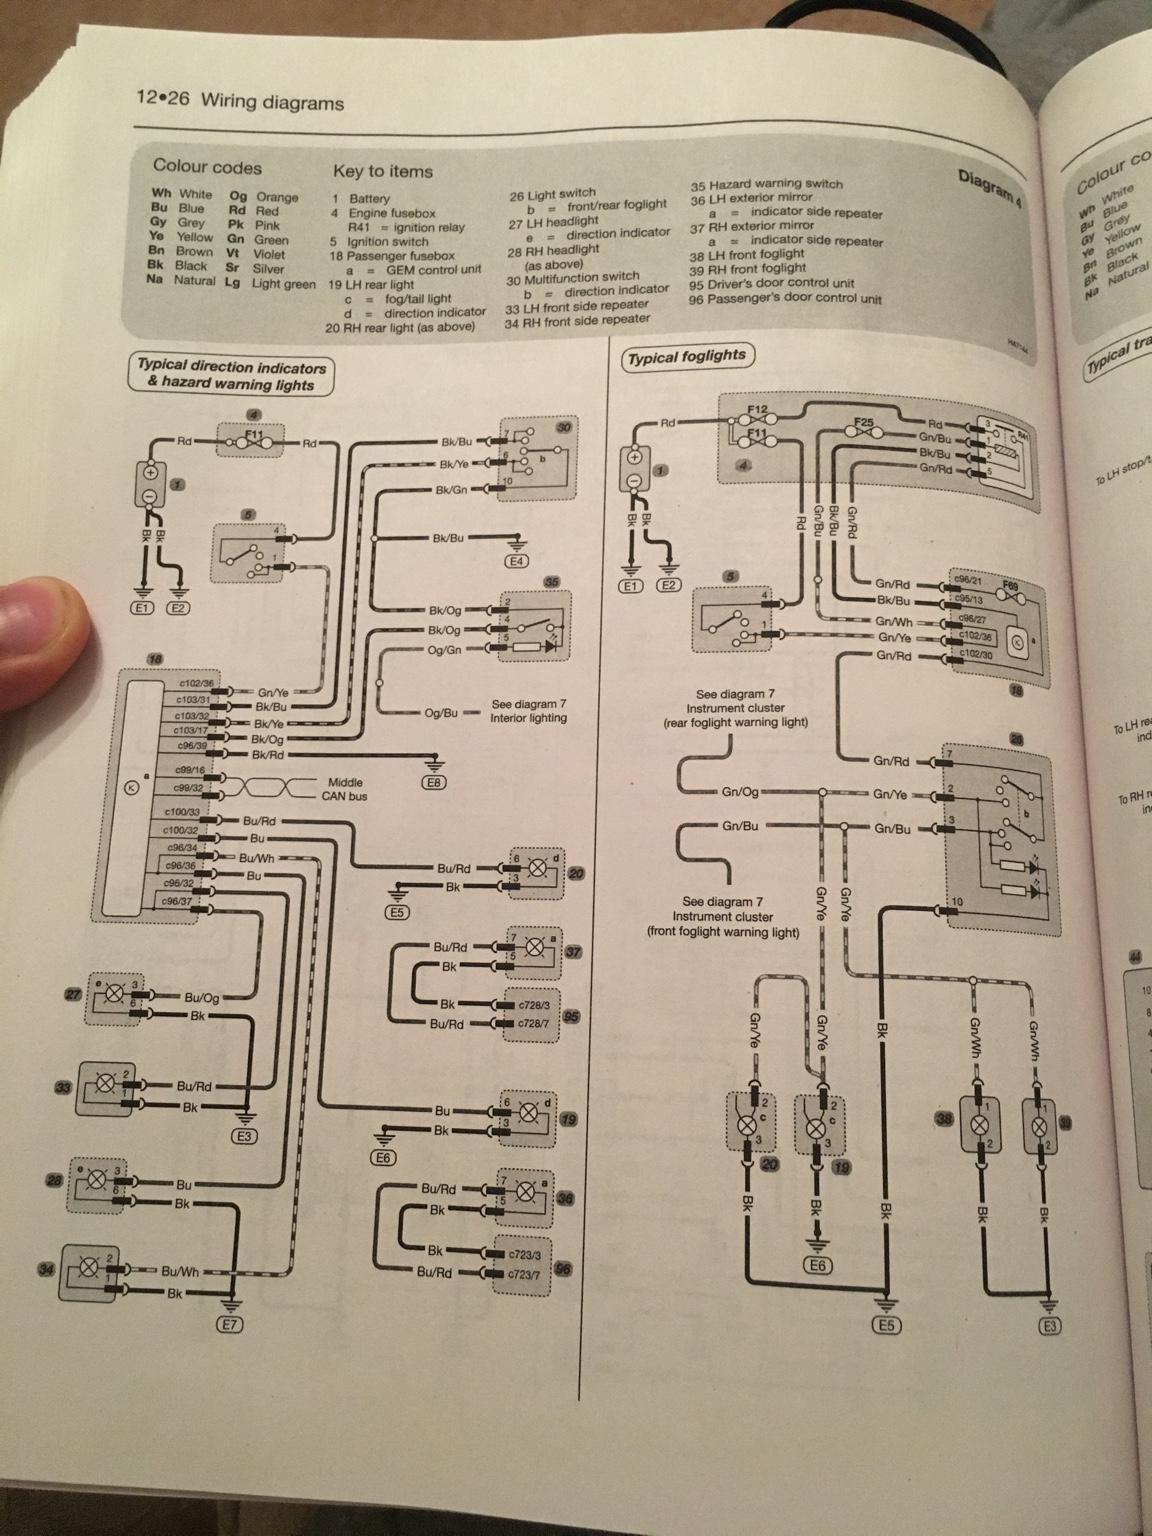 Cat 5 Wiring Diagram Pdf For Pinterest